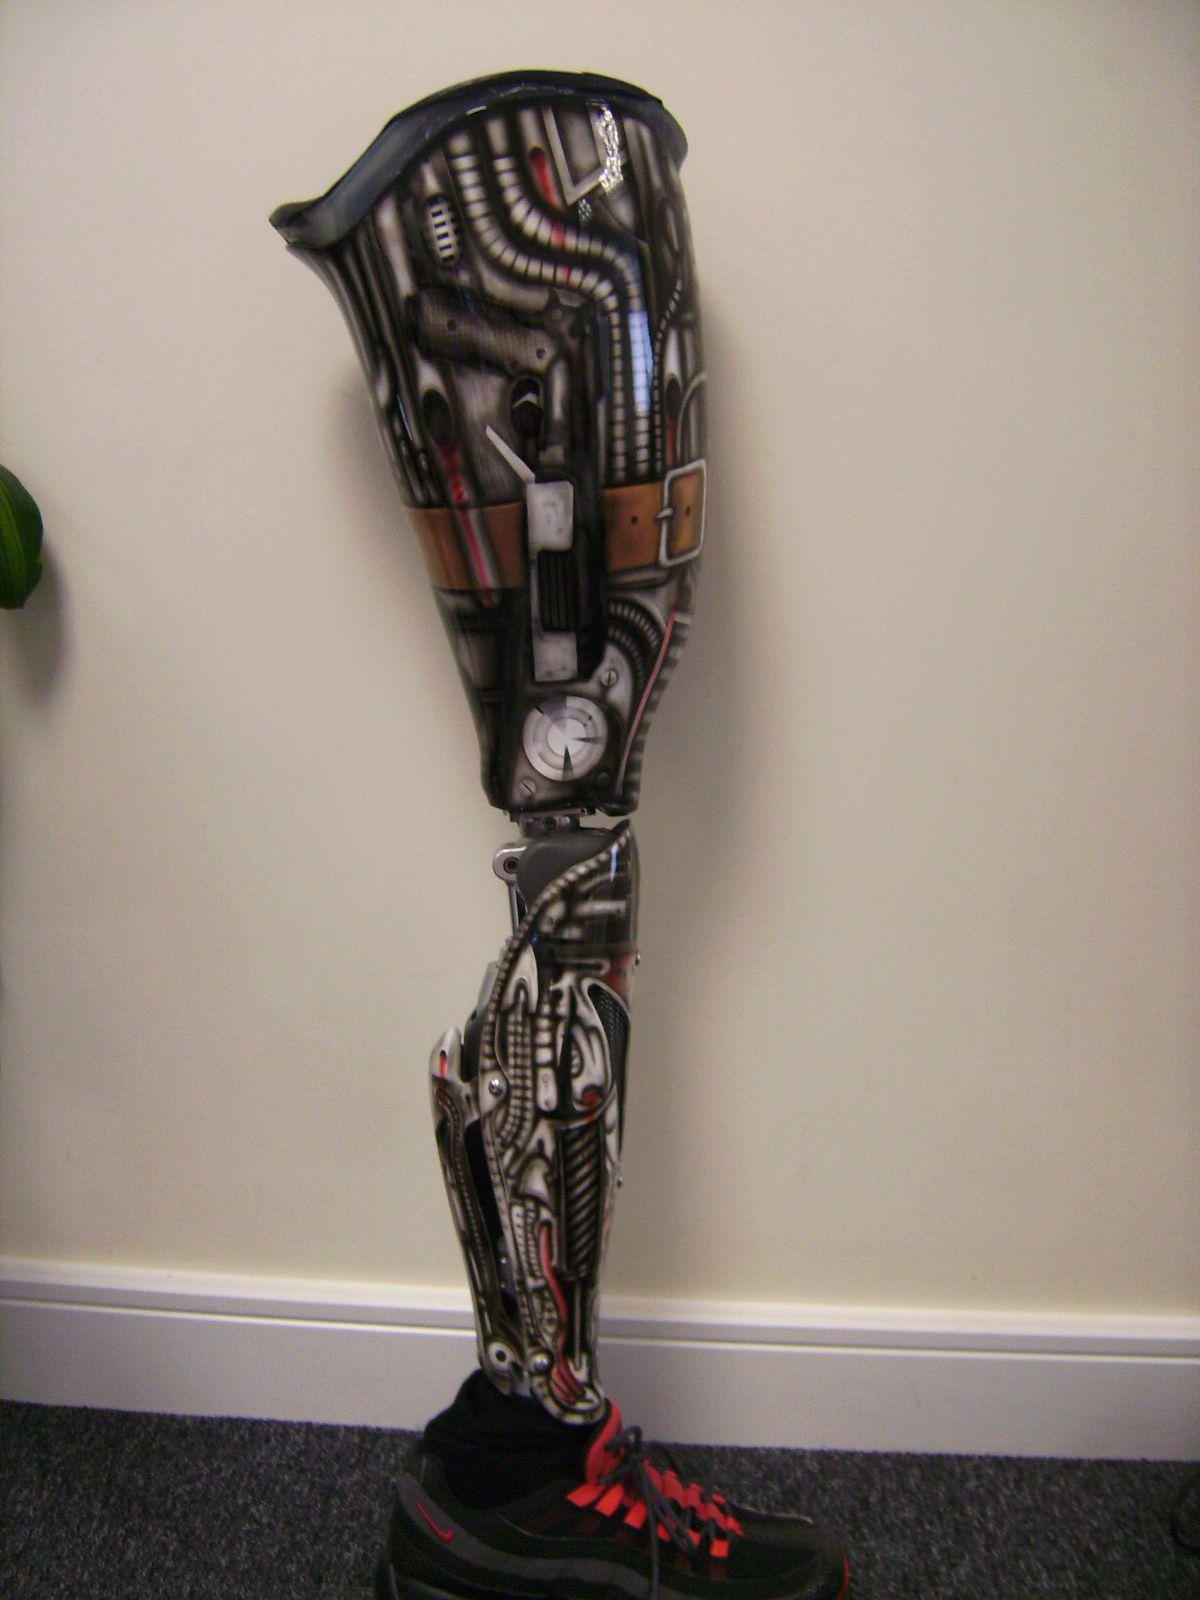 Prothesis prosthetic